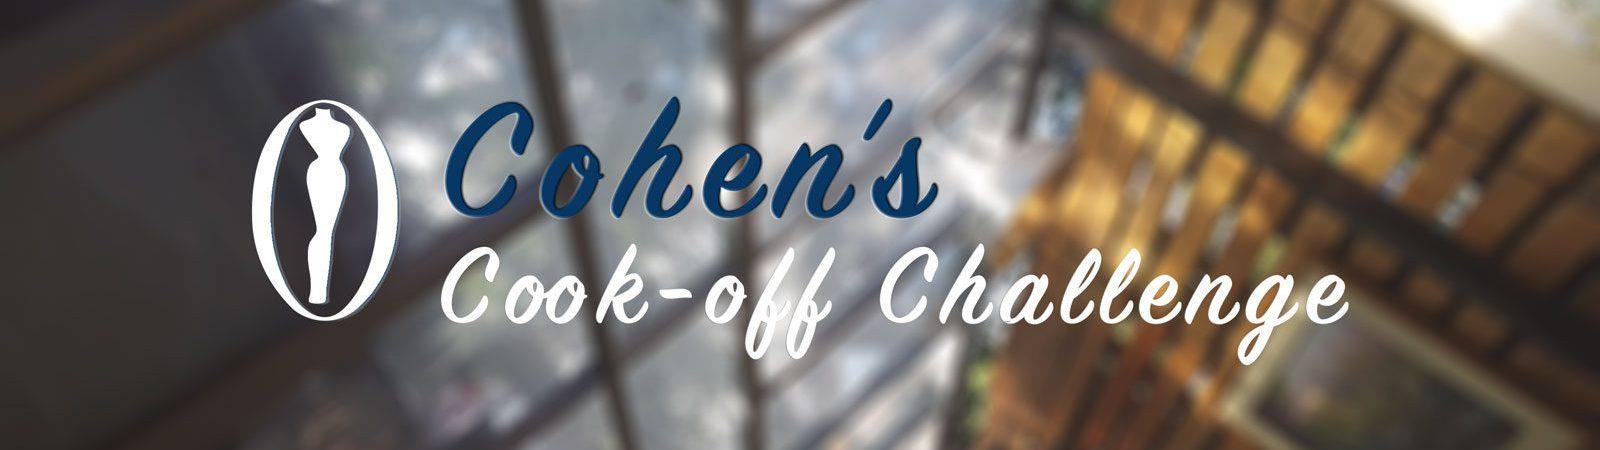 cohen cook-off challenge